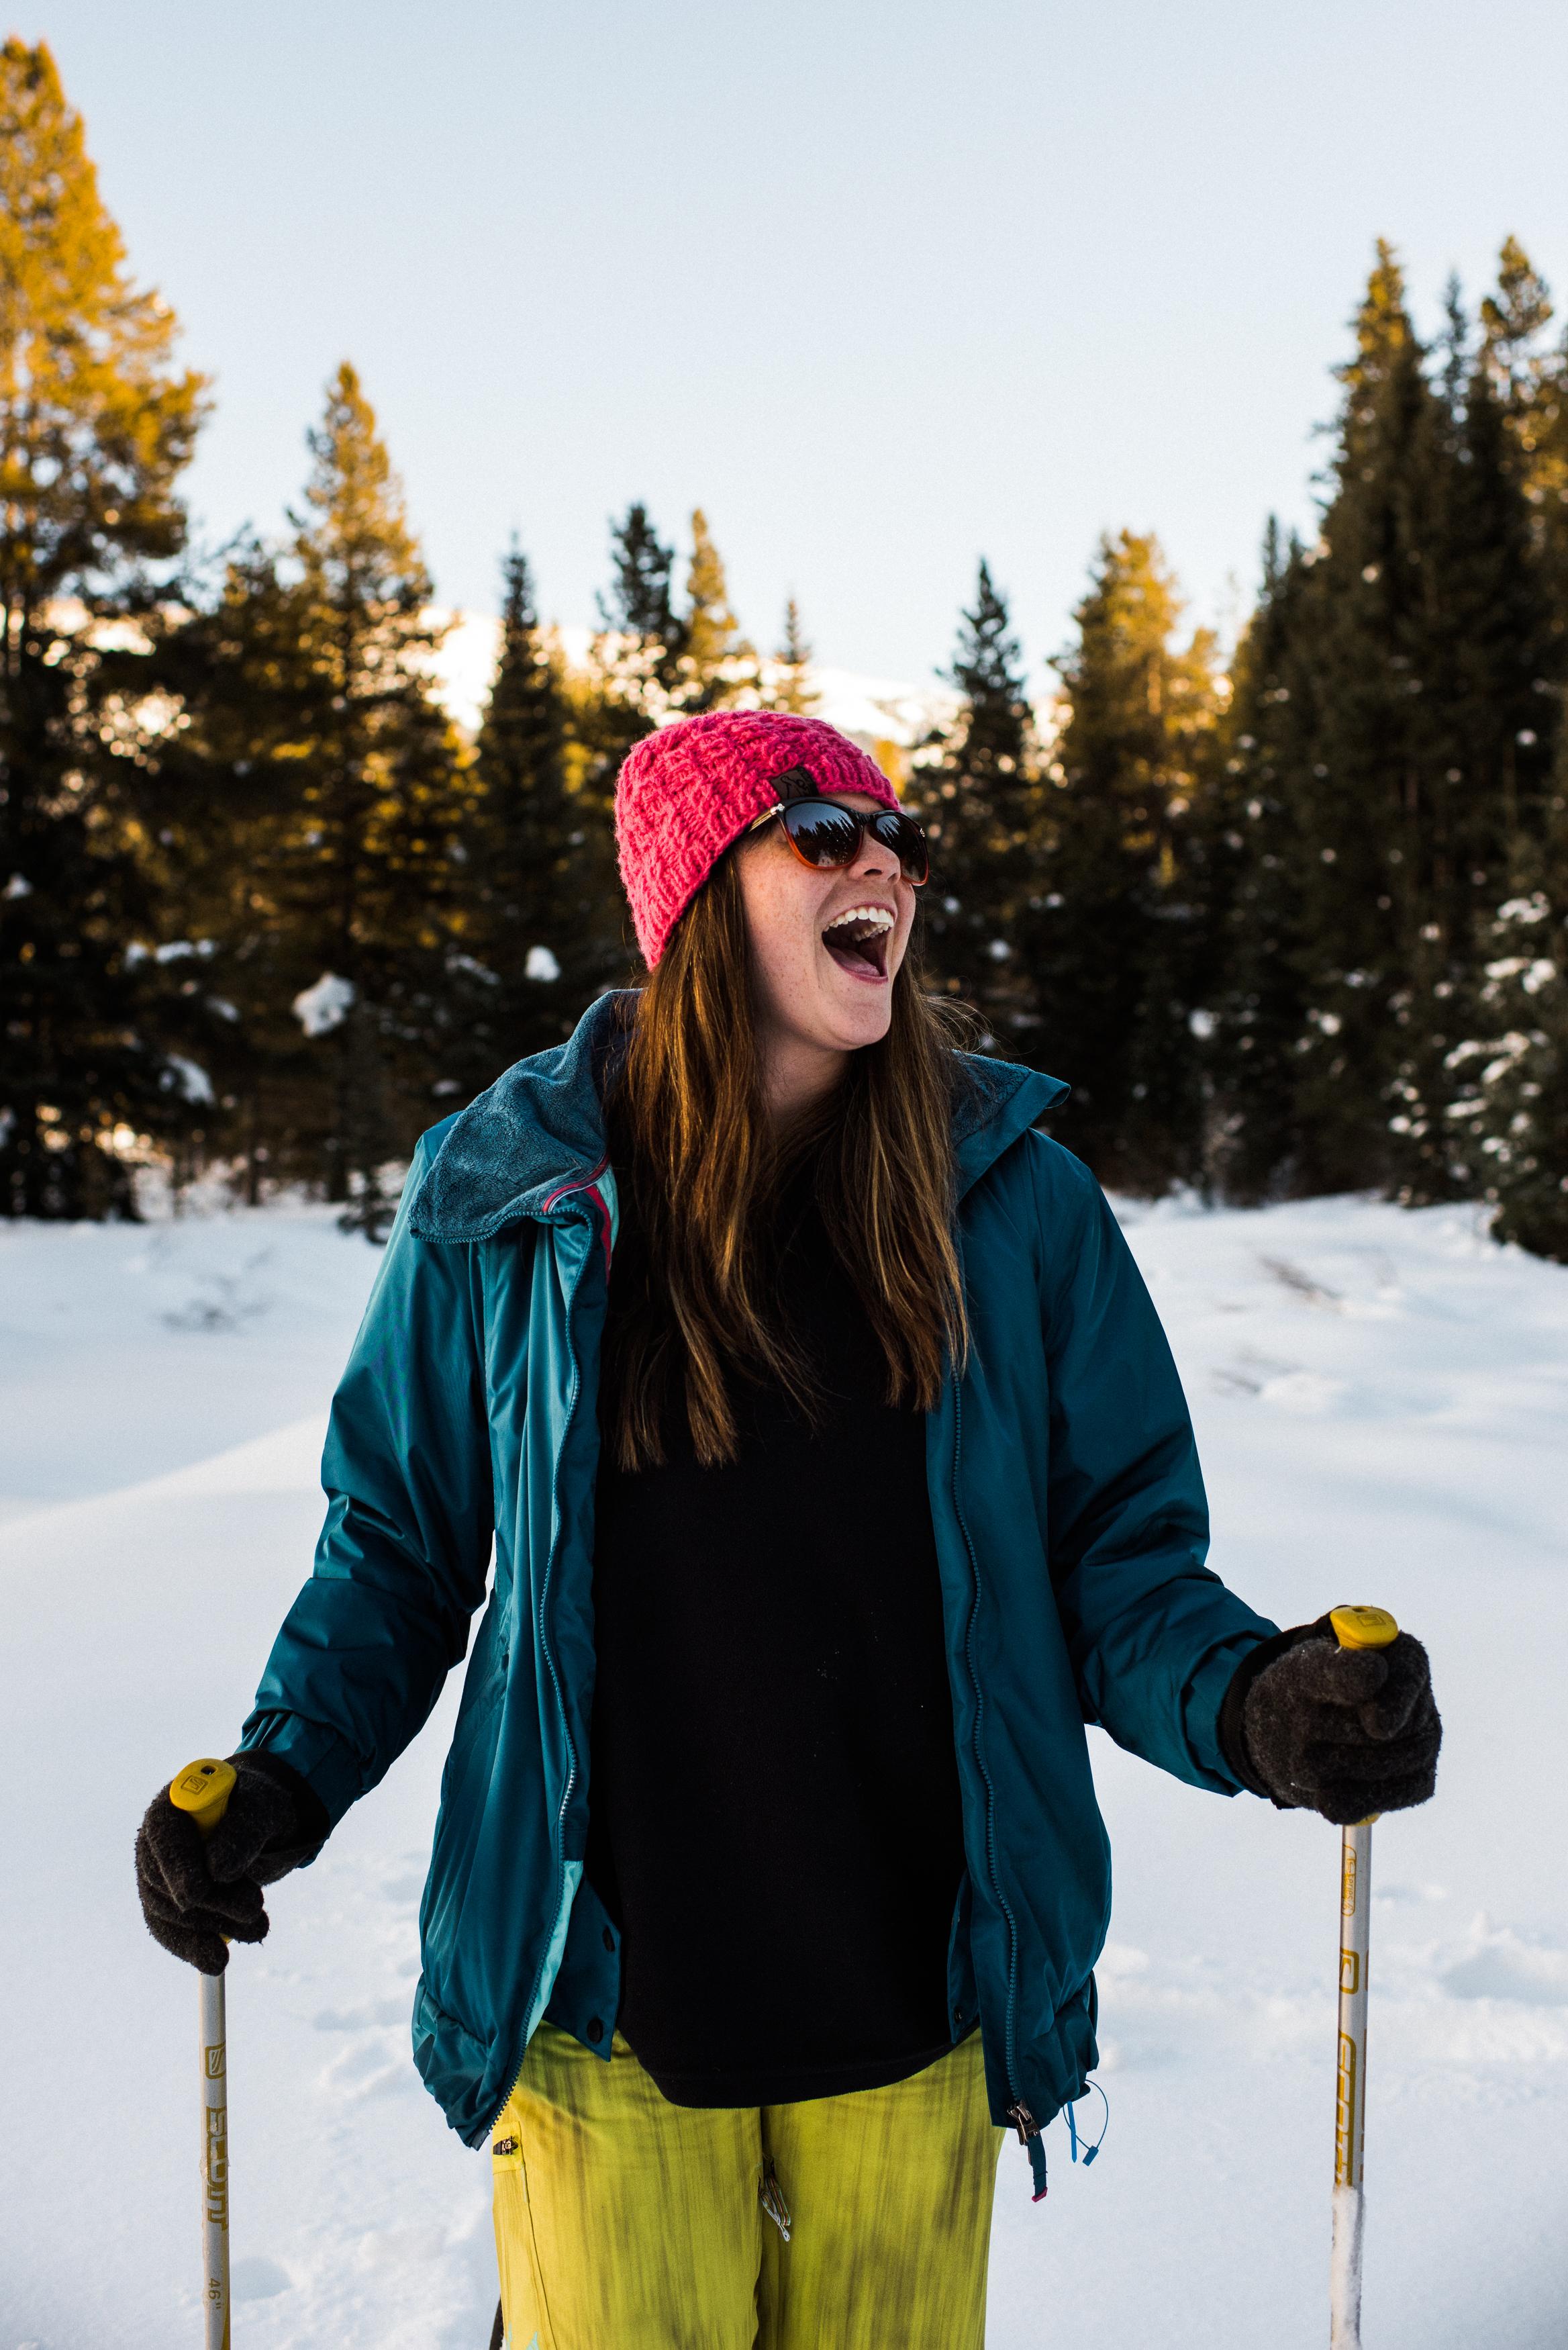 TaraShupe_Outdoor_Photographer_Loweprobags_Colorado_Copper_Mountains_Ski_78.jpg